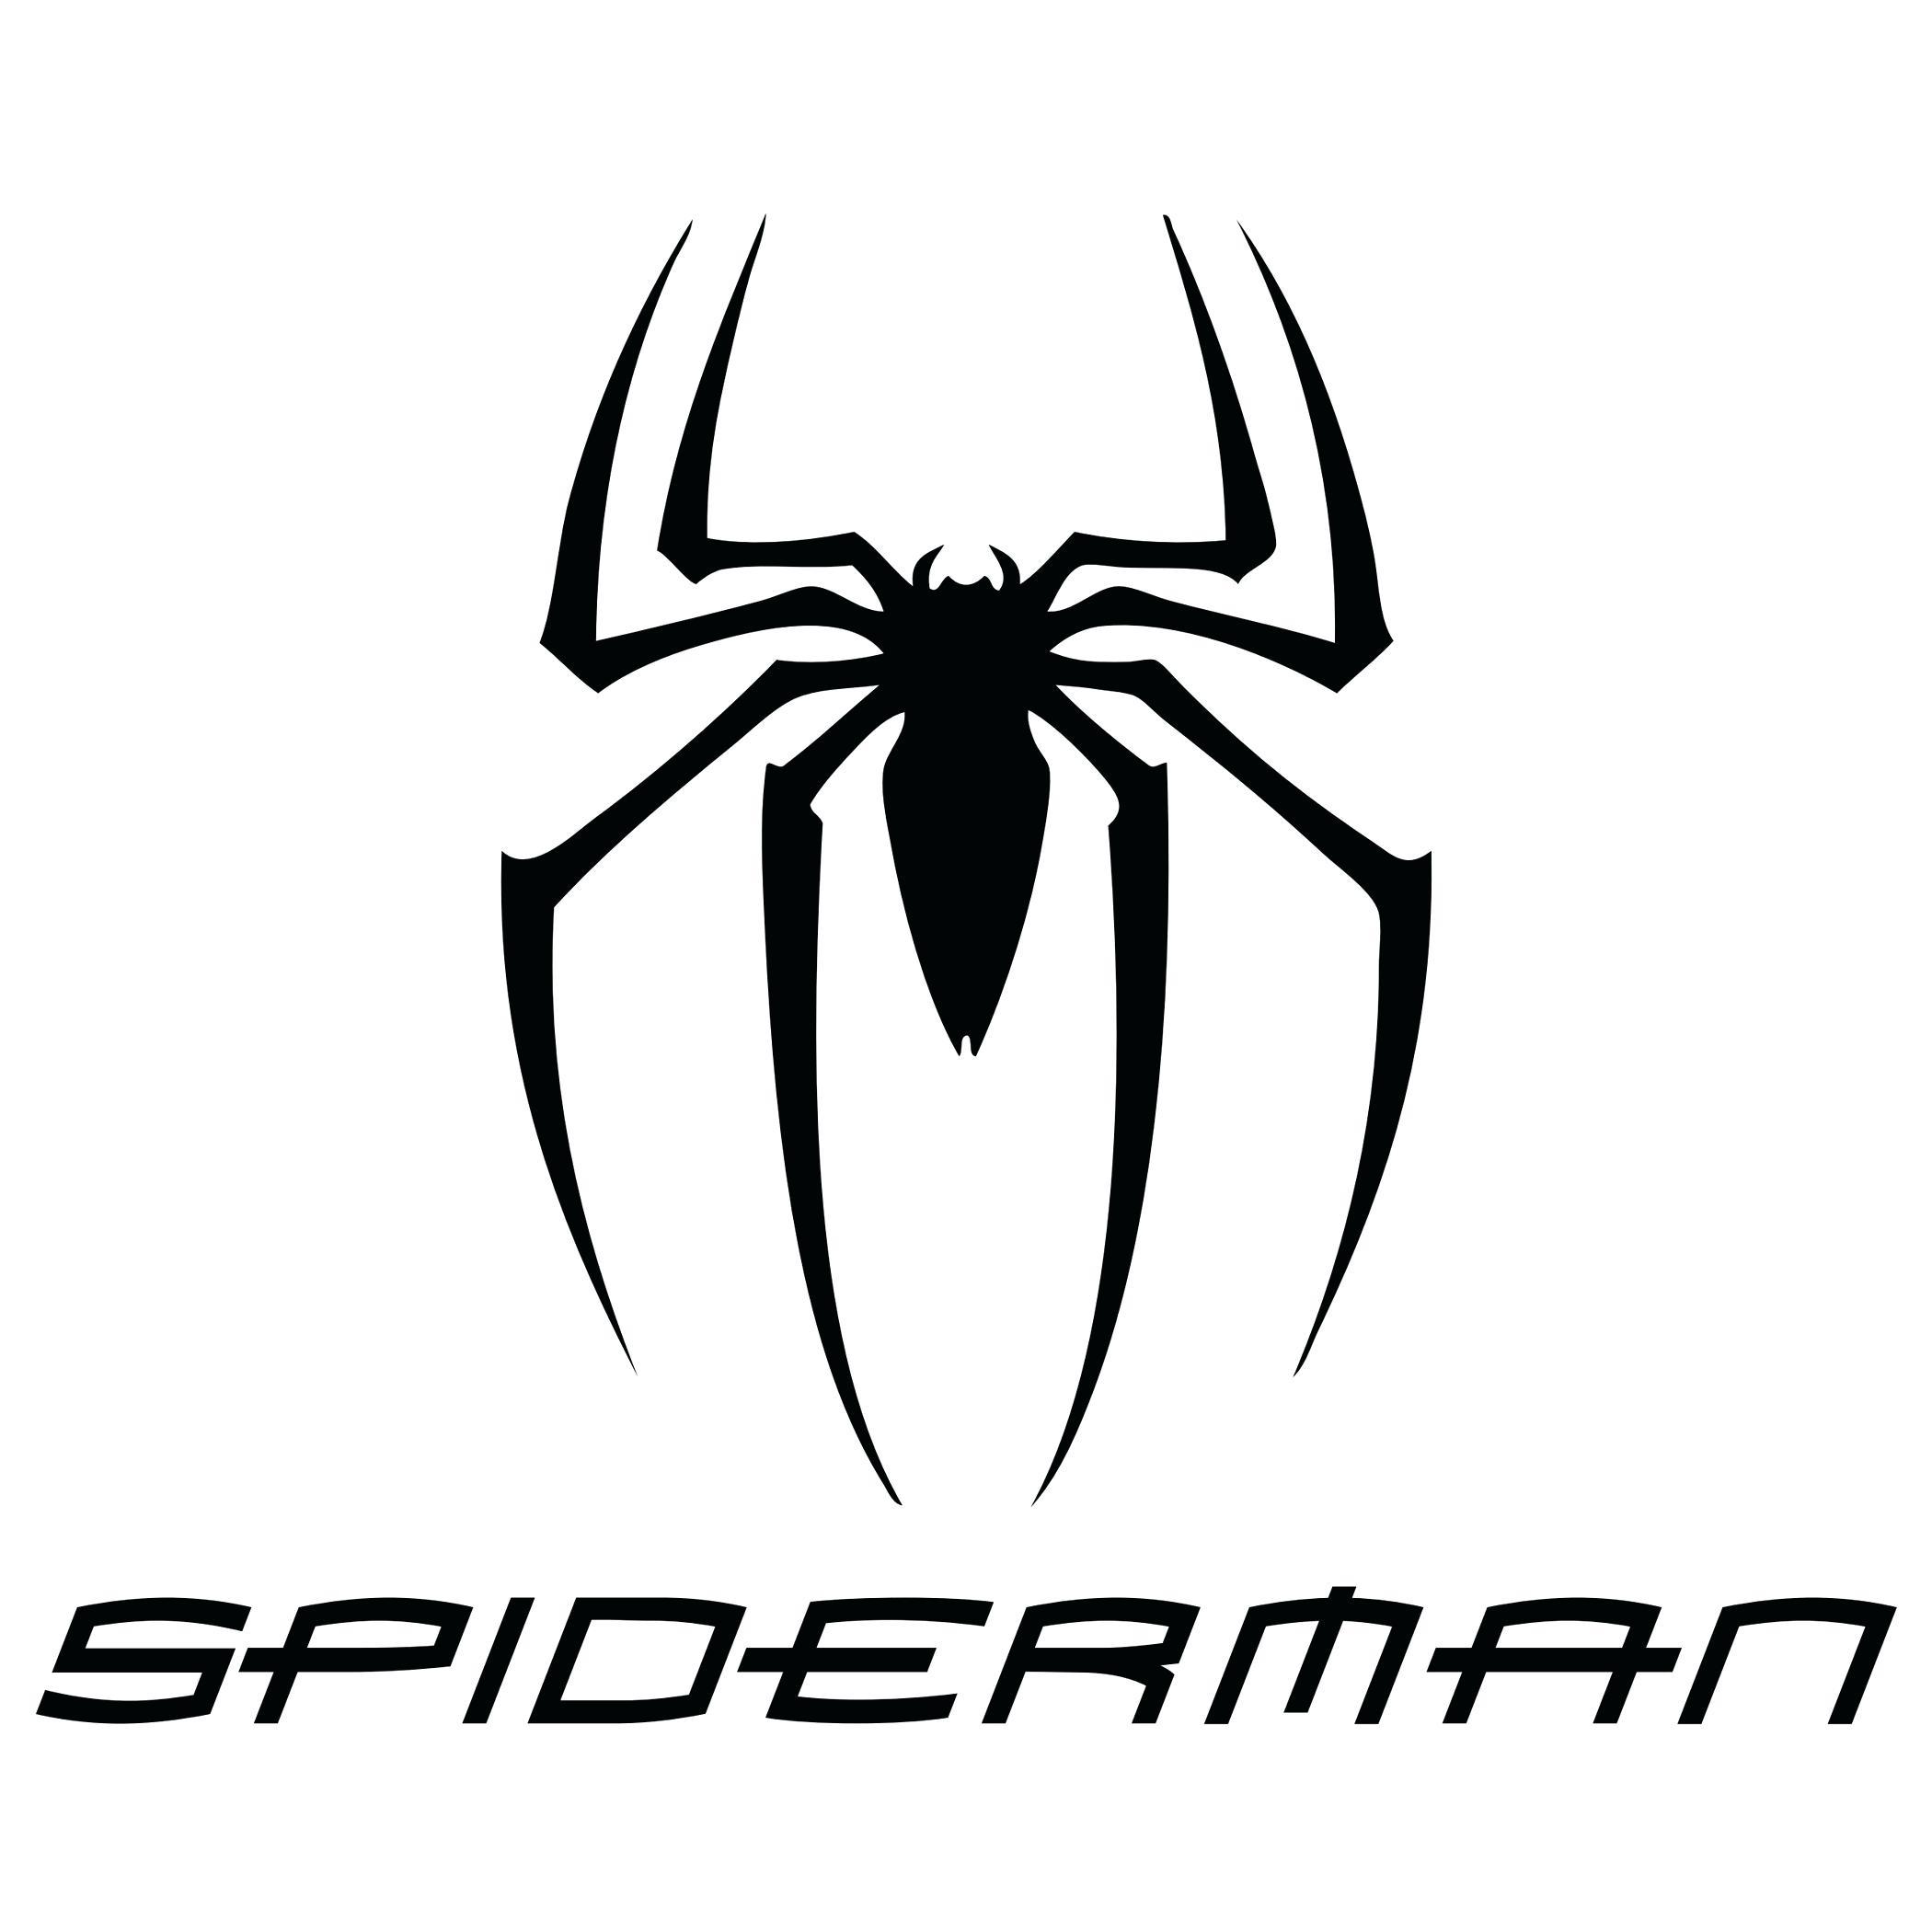 2100x2100 Printable Printable Spider Man Stencils Logo Vector In Format Art